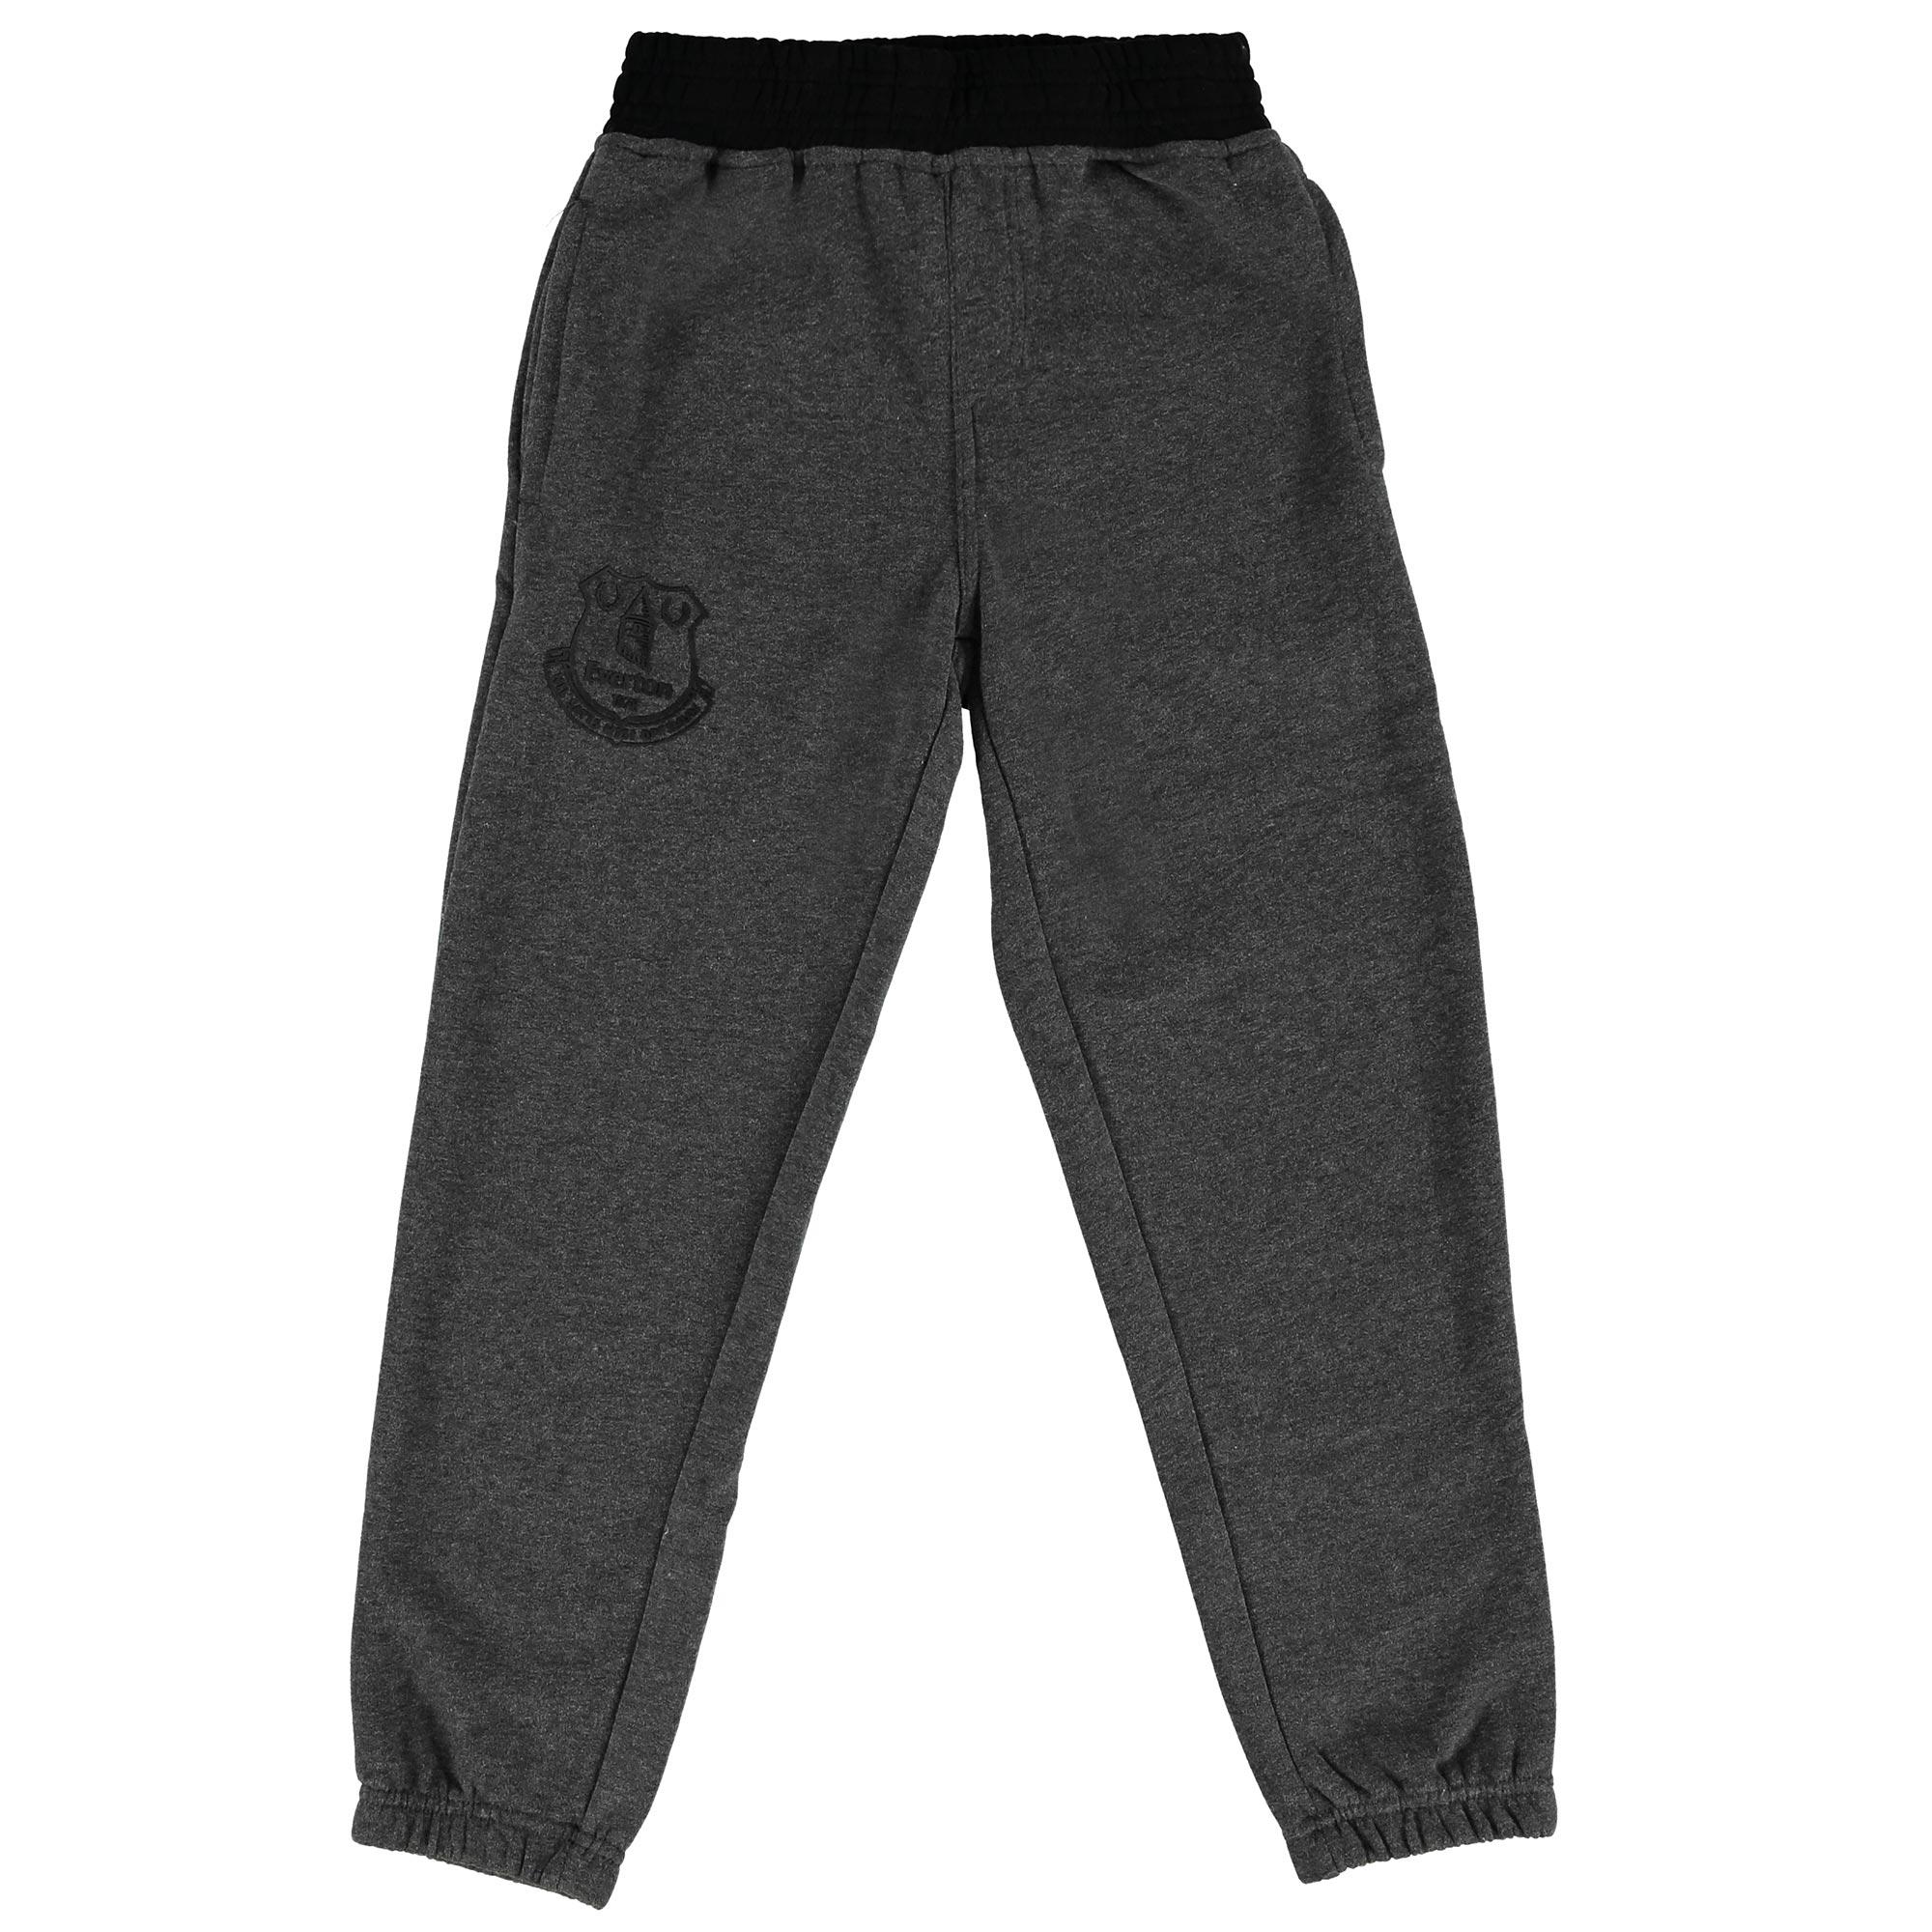 Everton Essentials Slim Fit Jogger - Grey Marl/Black - Junior